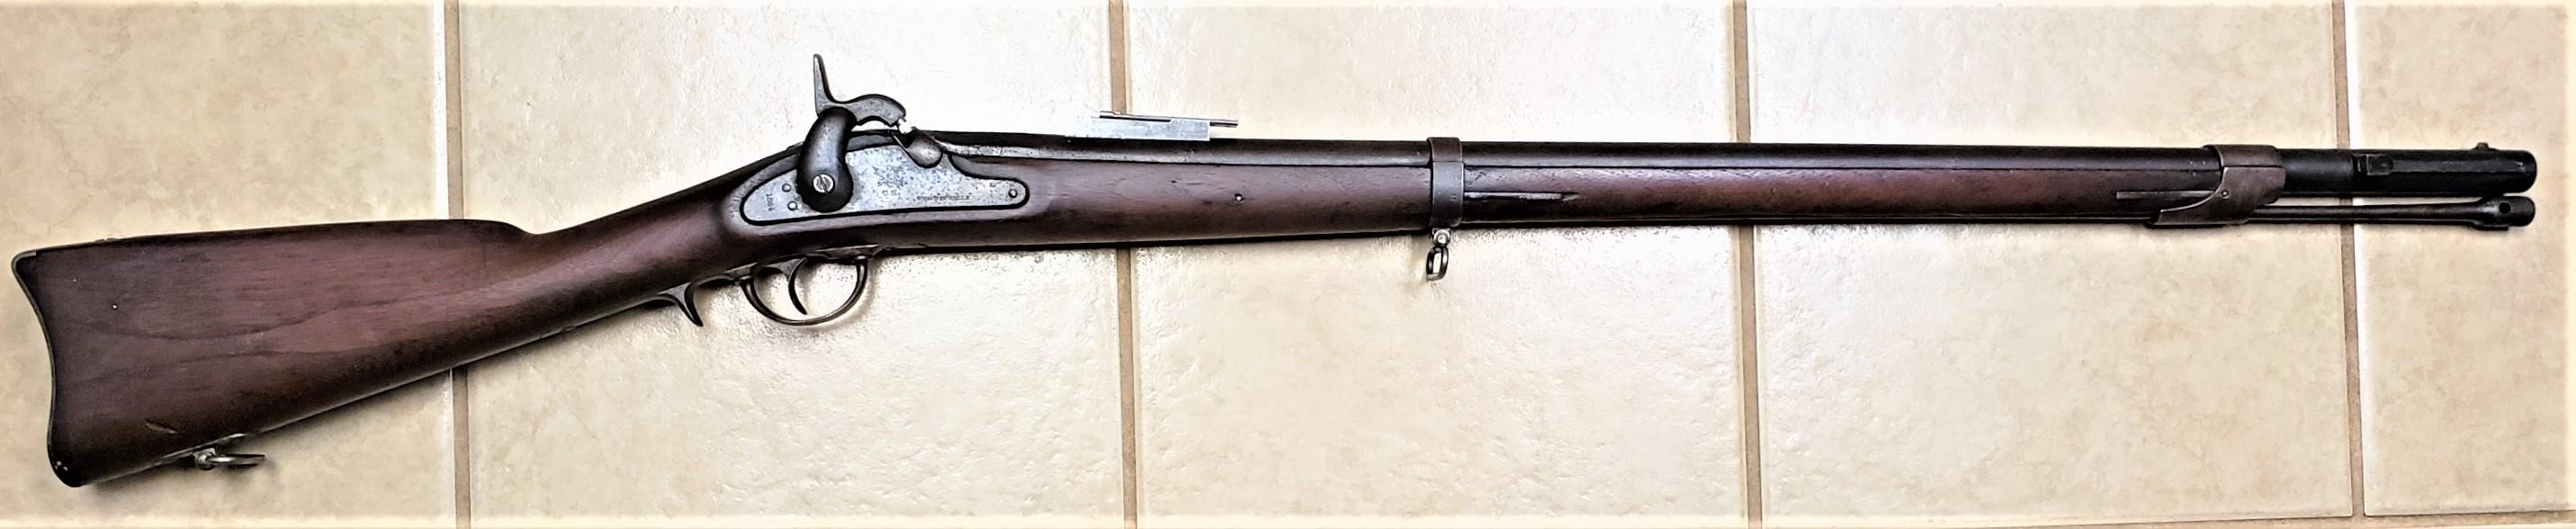 Name:  Plymouth Rifle.jpg Views: 355 Size:  340.8 KB